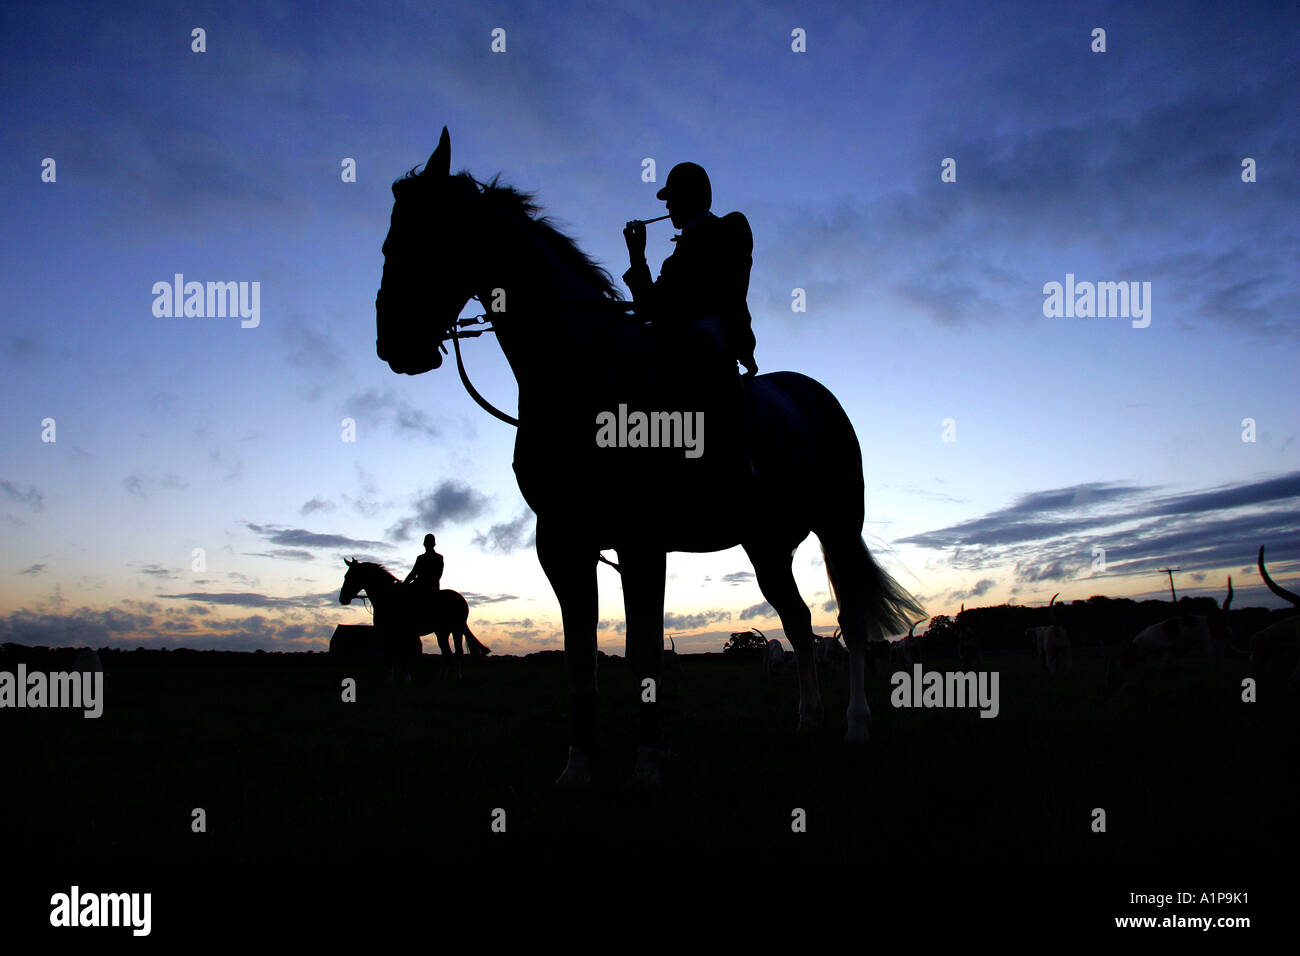 Silhouette der Jäger klingt das Horn um den Beginn einer Morgendämmerung signalisieren jagen in Gloucester UK Stockbild